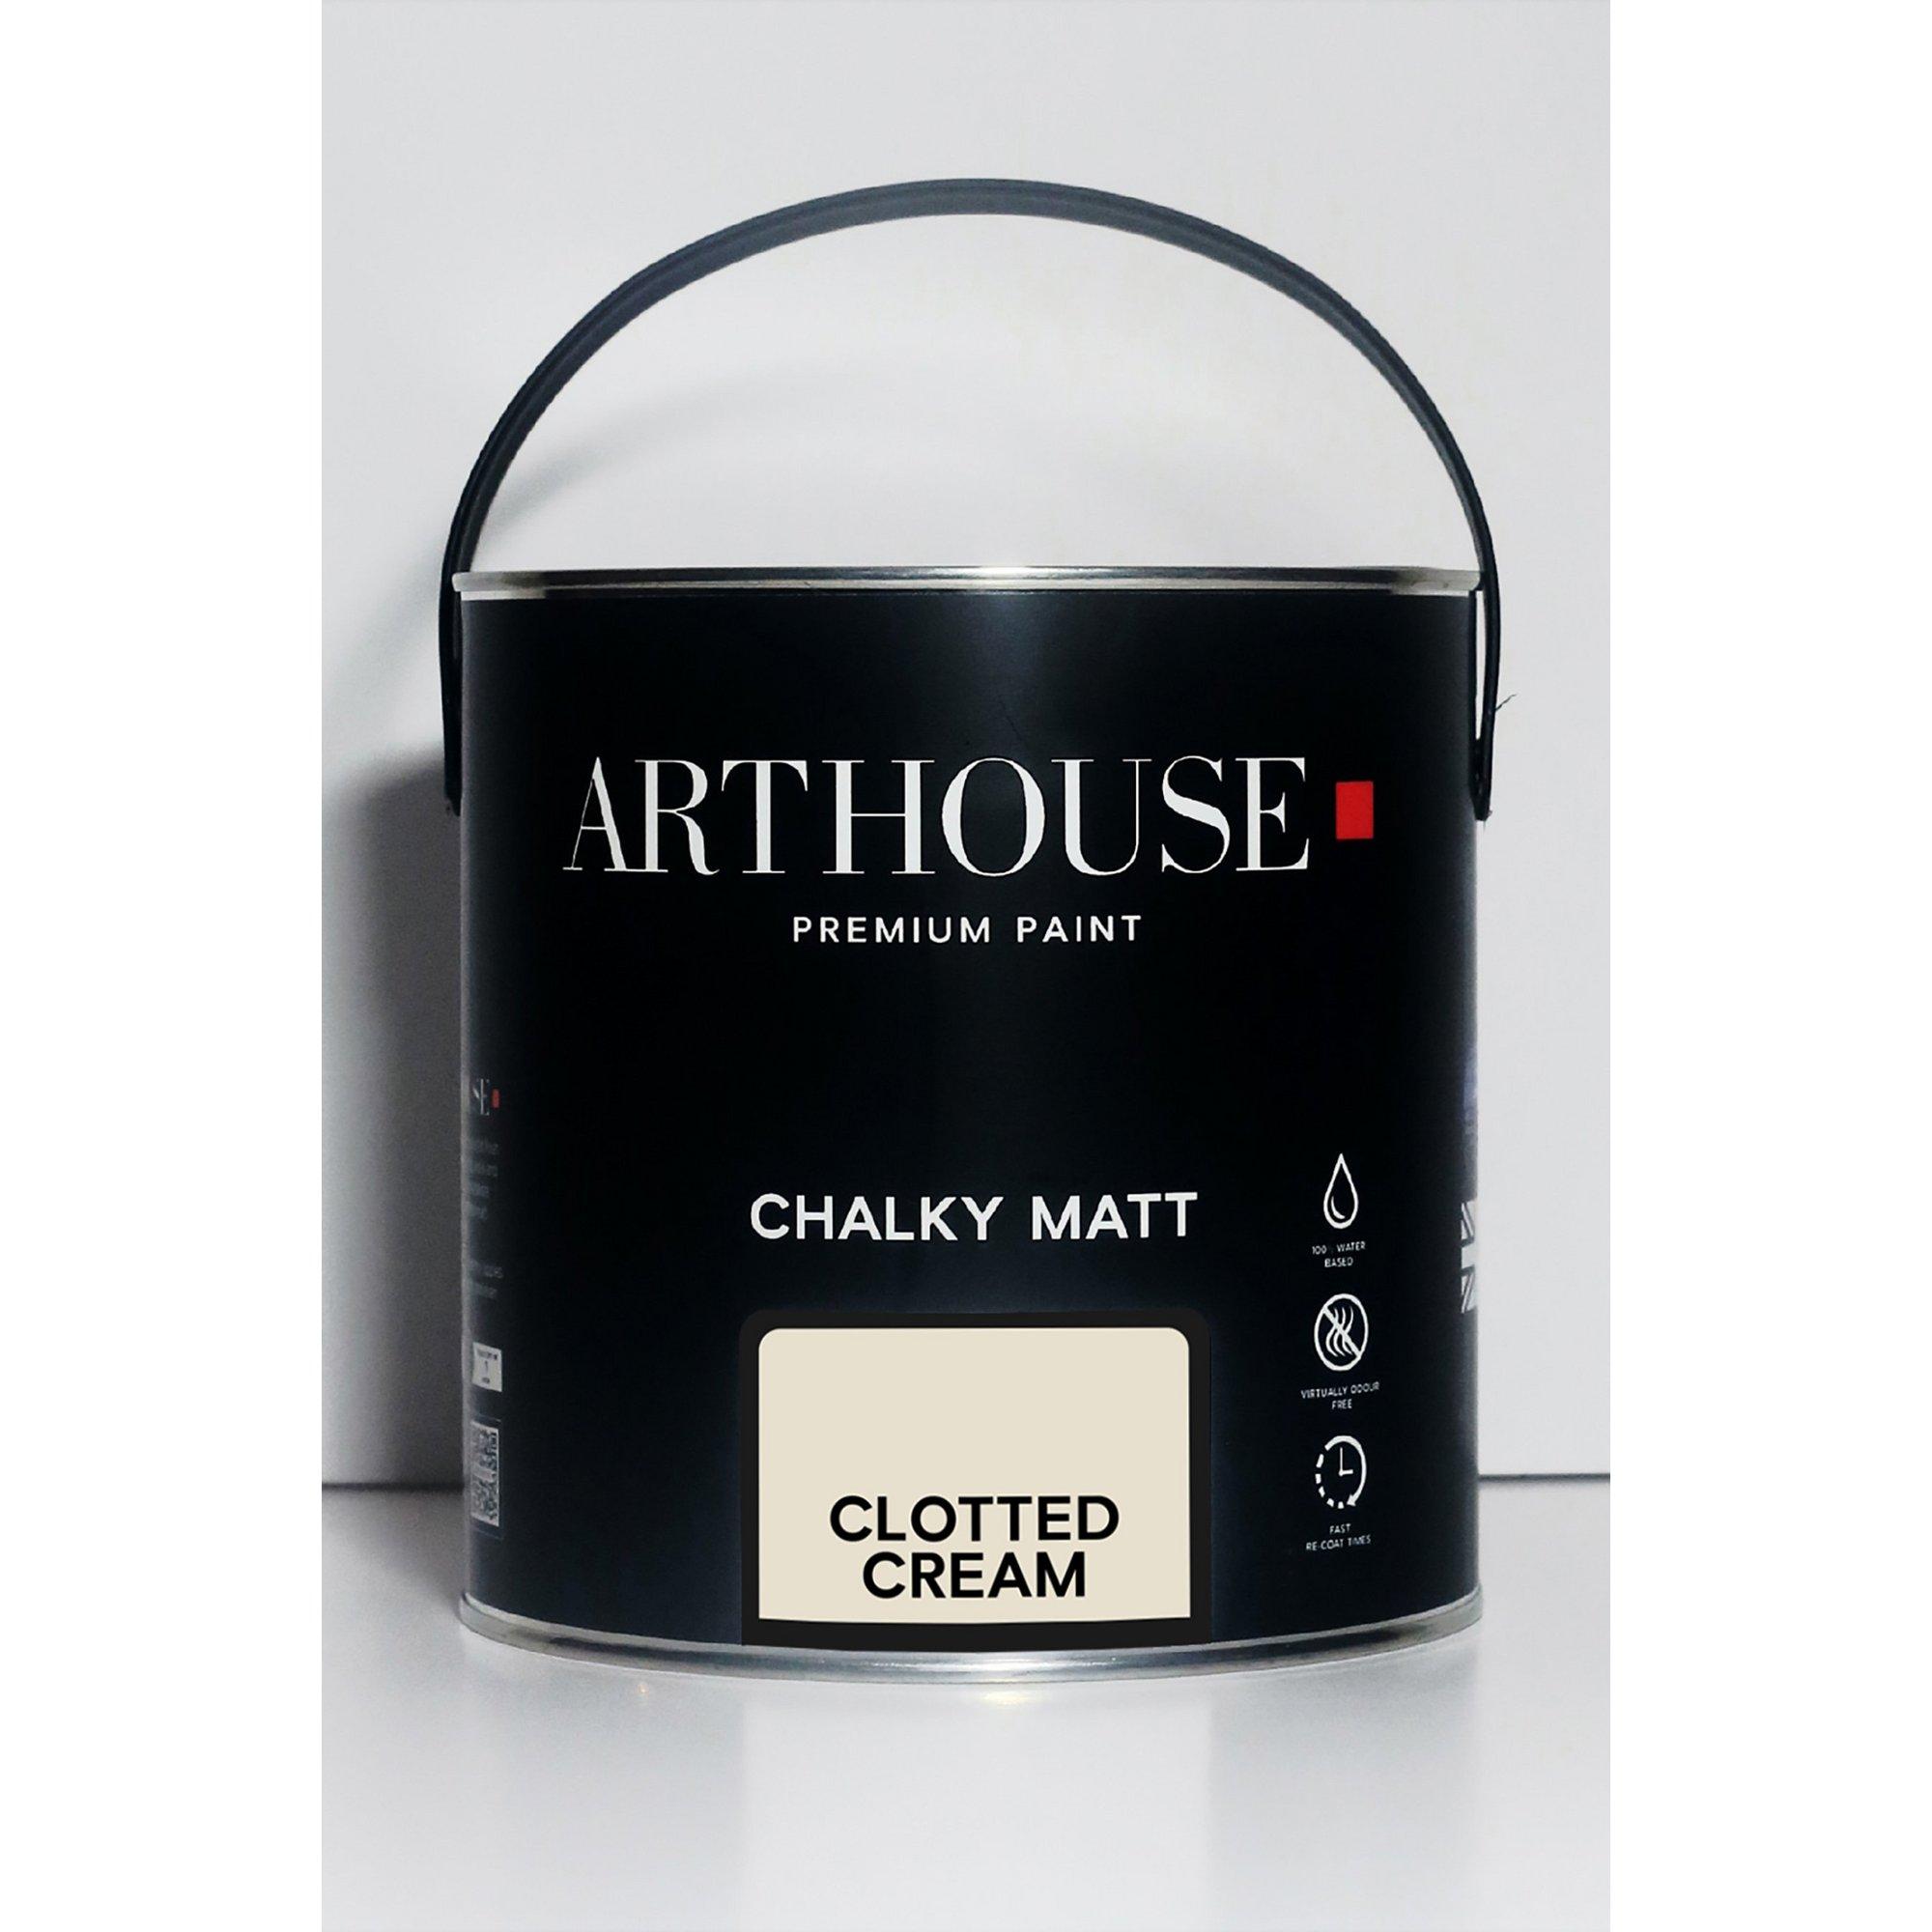 Image of Chalky Matt Clotted Cream Emulsion Paint